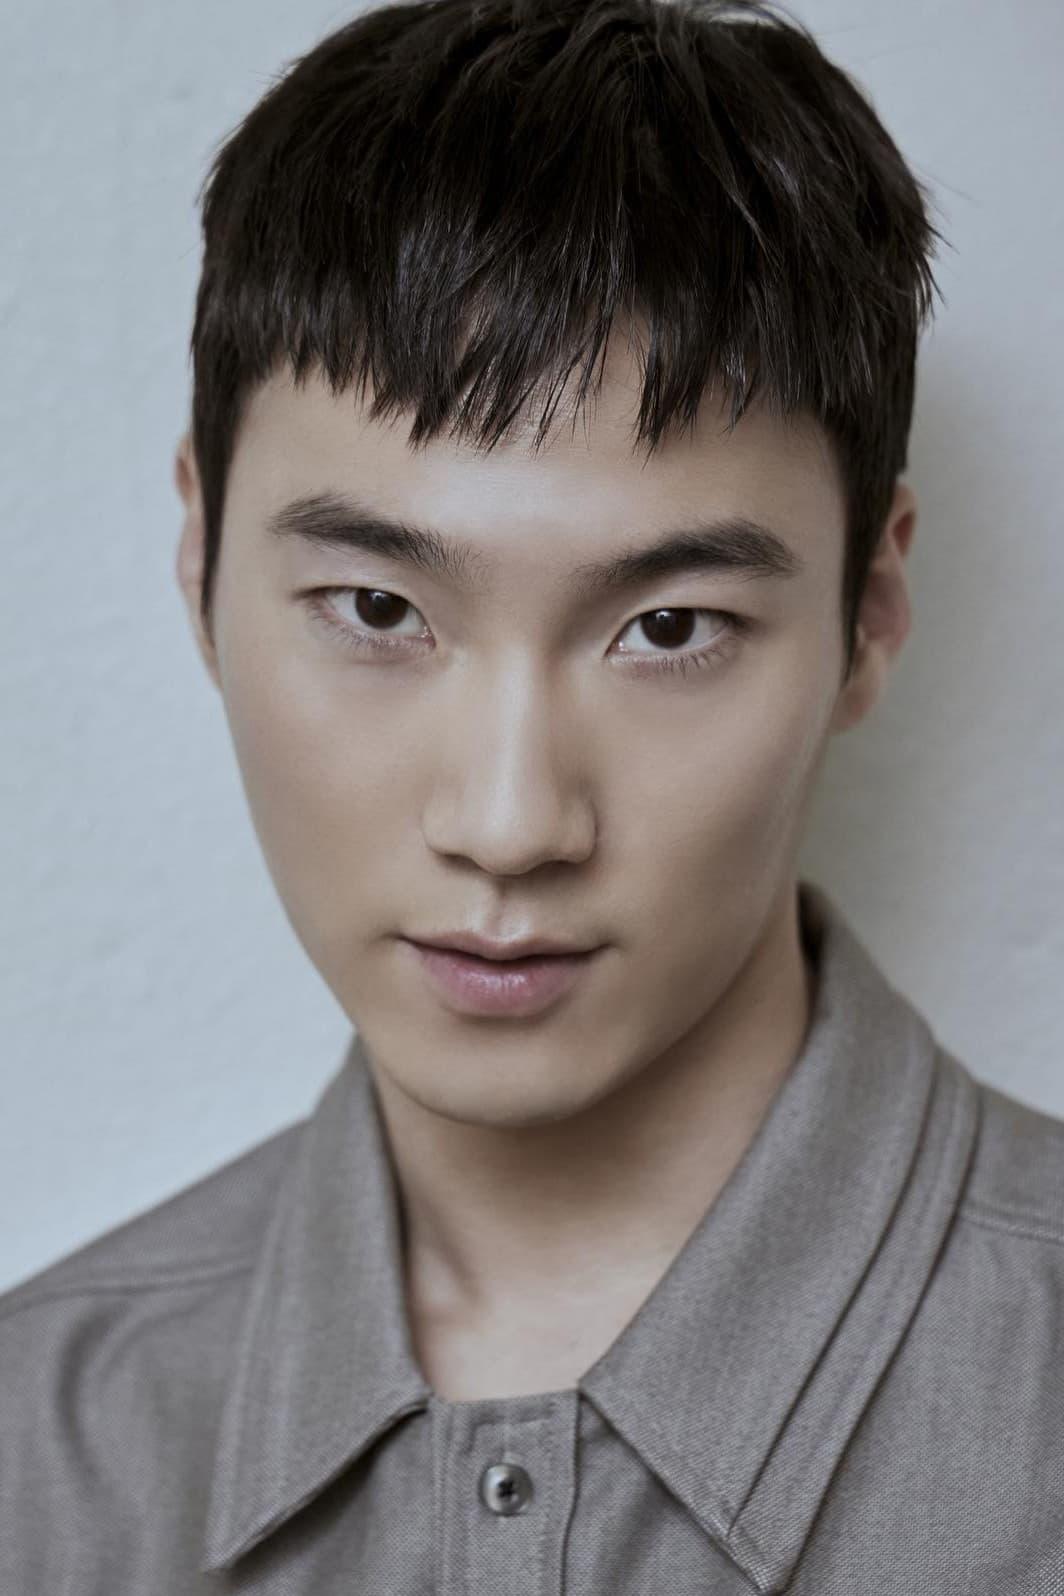 Lee Hong-nae